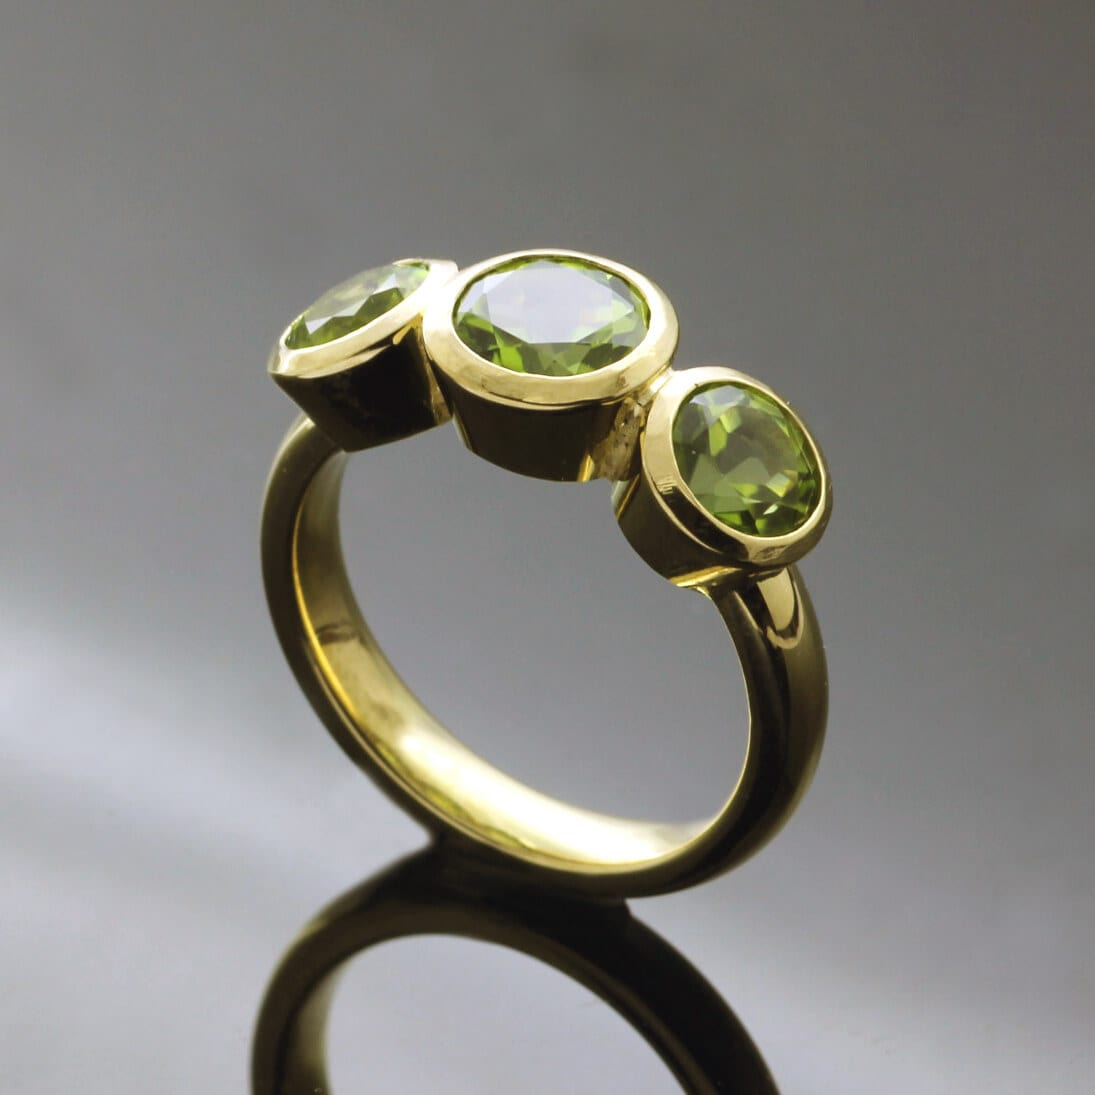 Handmade Bespoke Peridot Trilogy ring in Yellow Gold